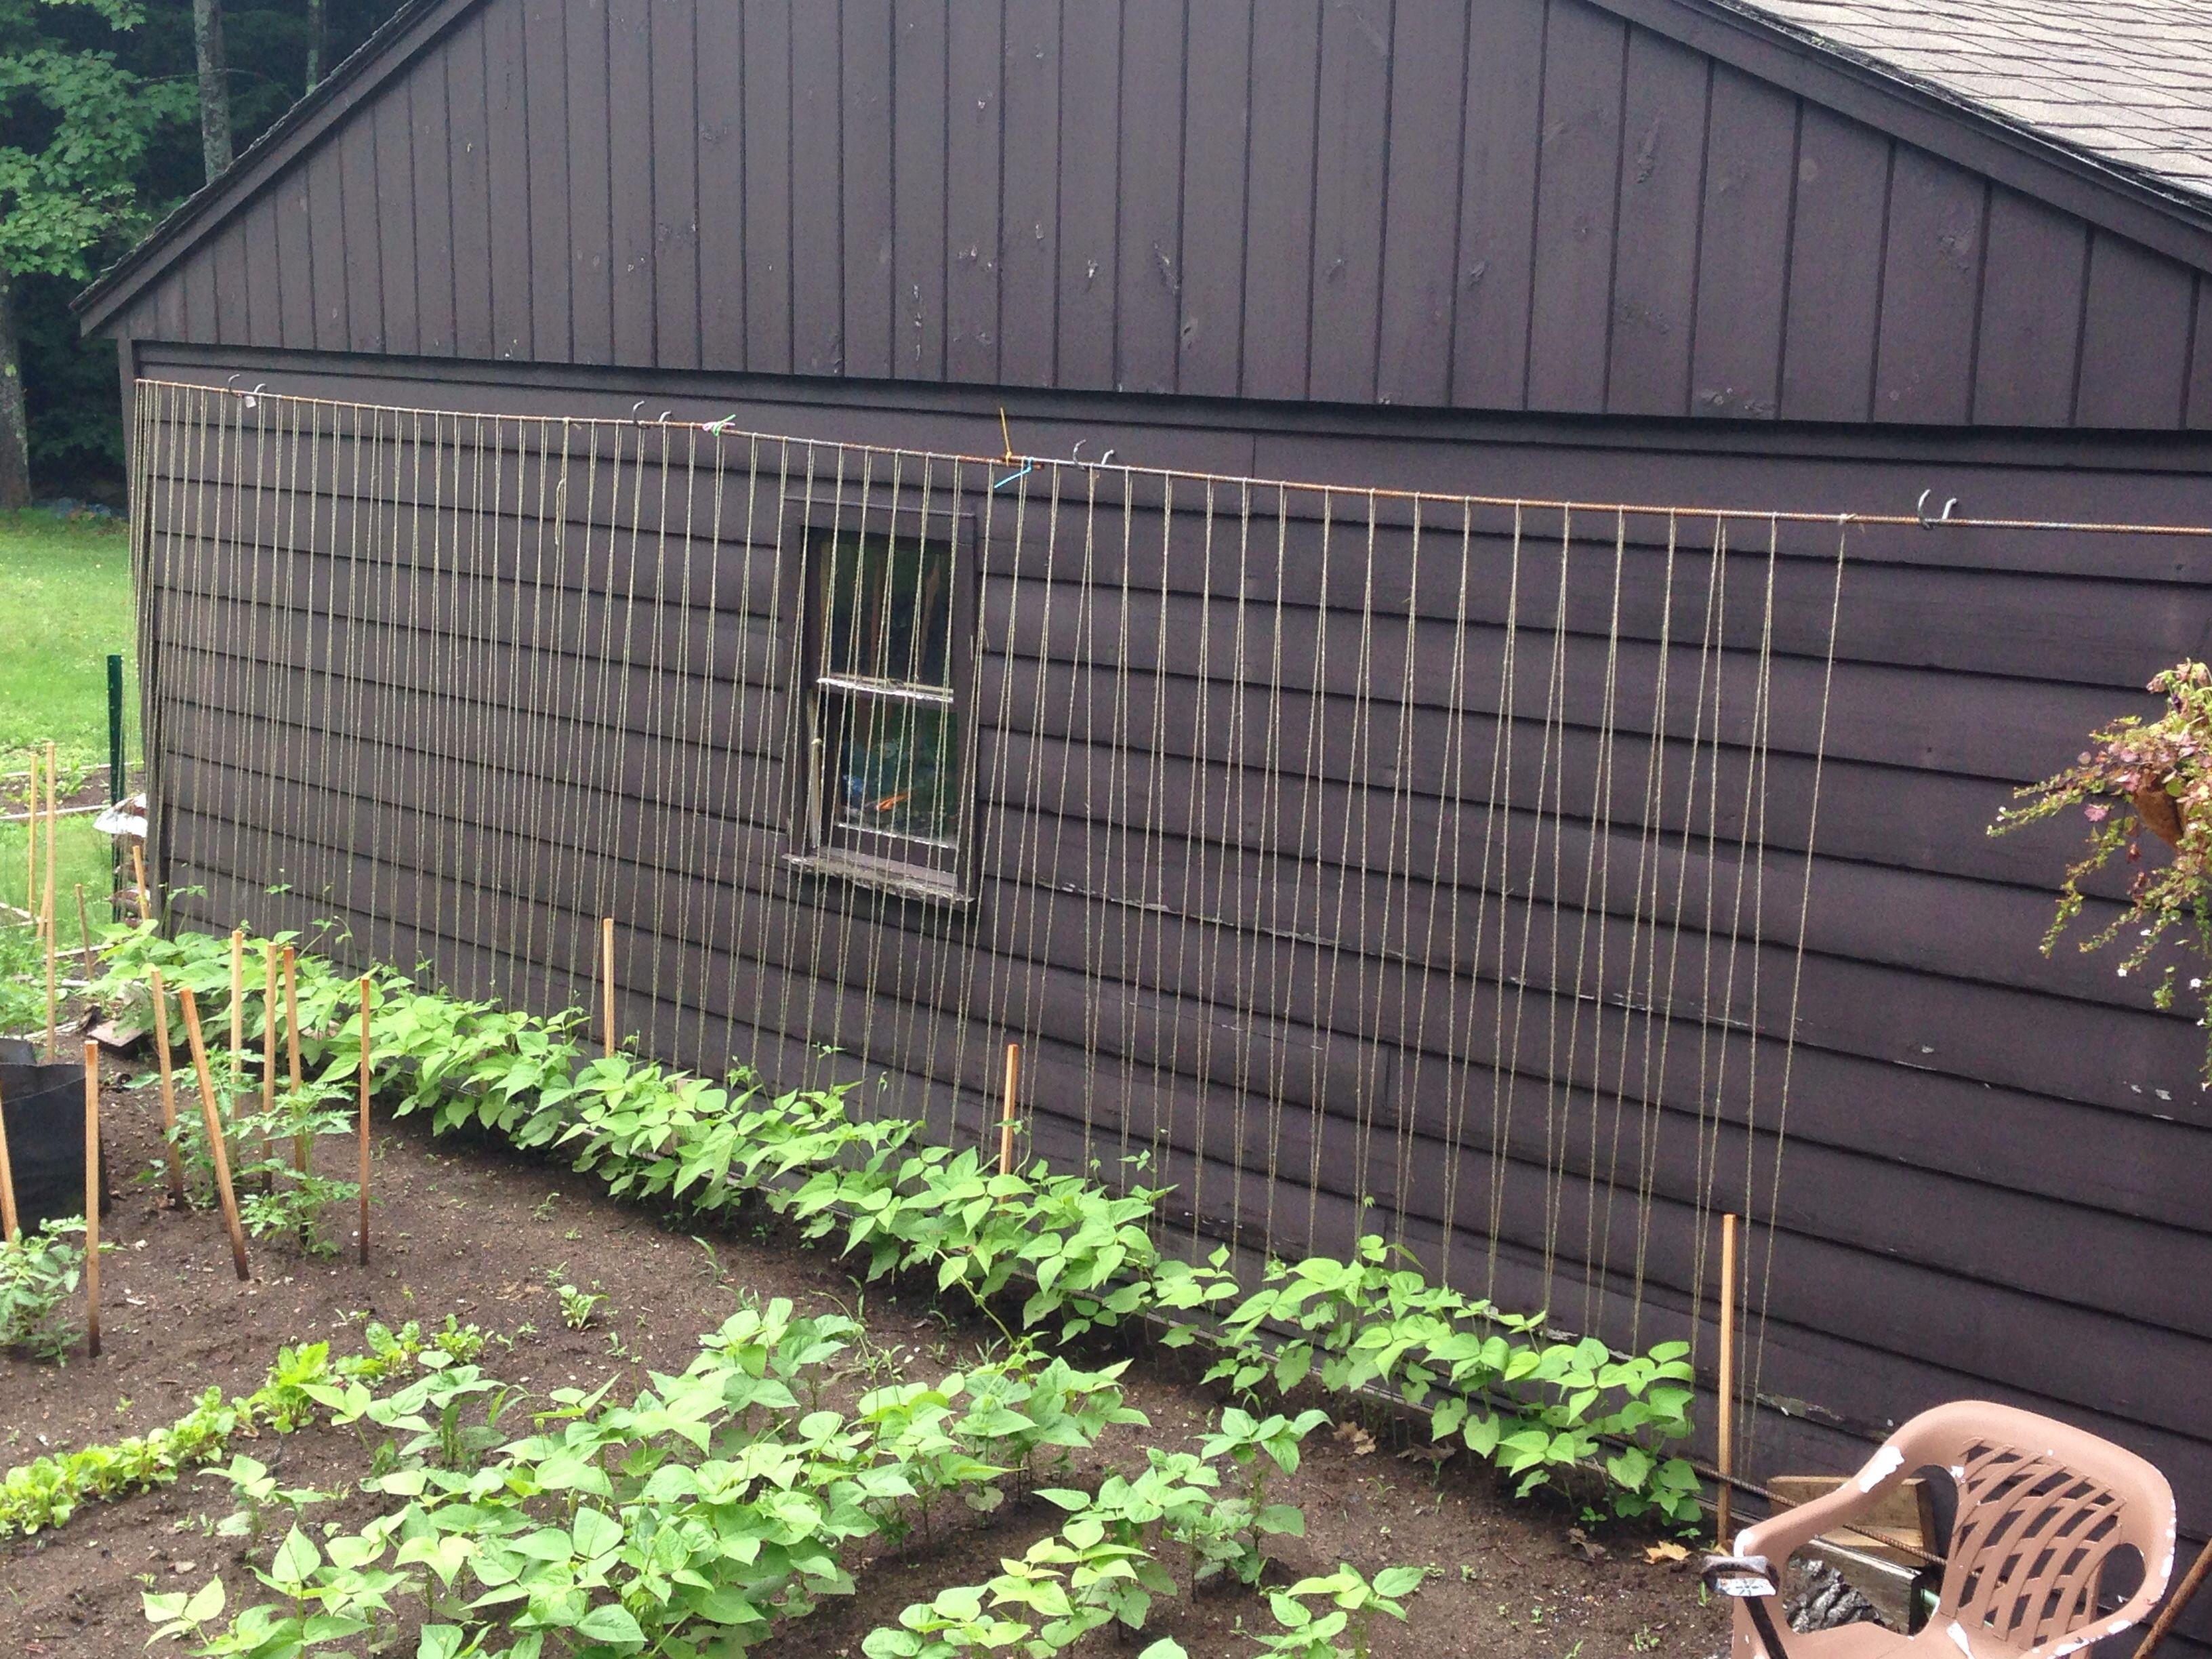 Green Bean Trellis Ideas Part - 48: This Years Green Bean Trellis Idea!! Looks Like It Gonna Work Great!